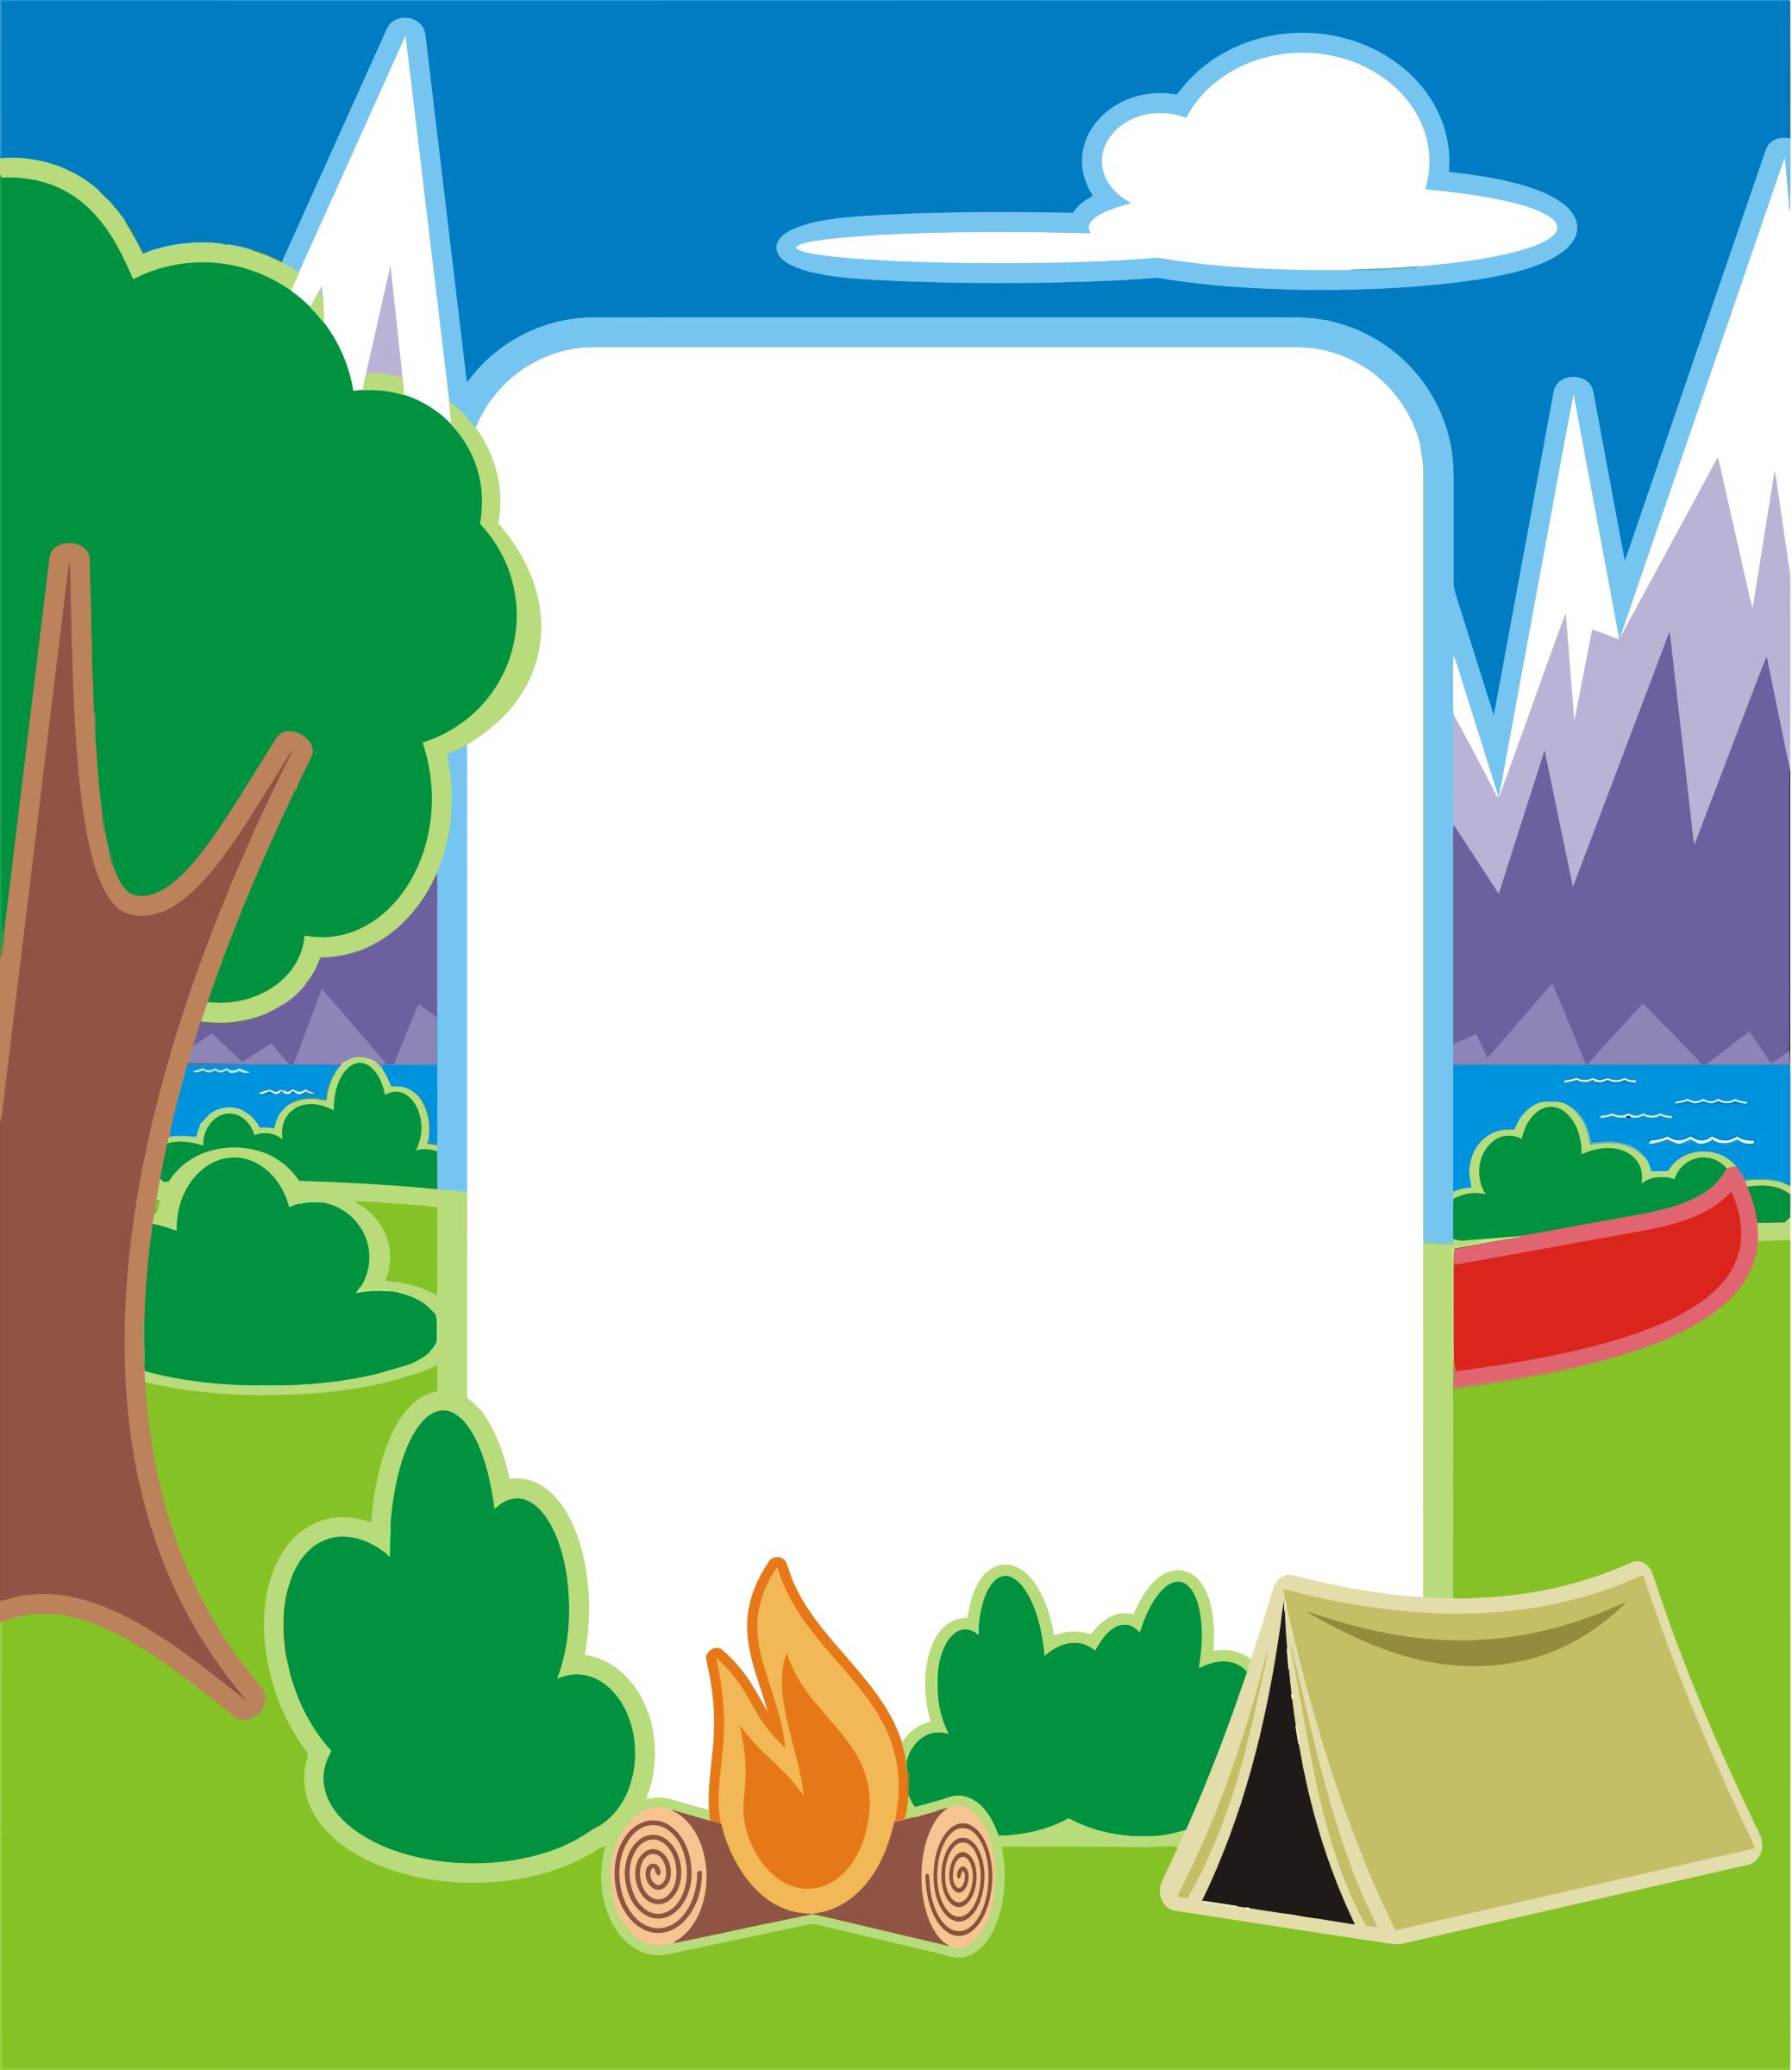 Camp clipart border. Sign big image png